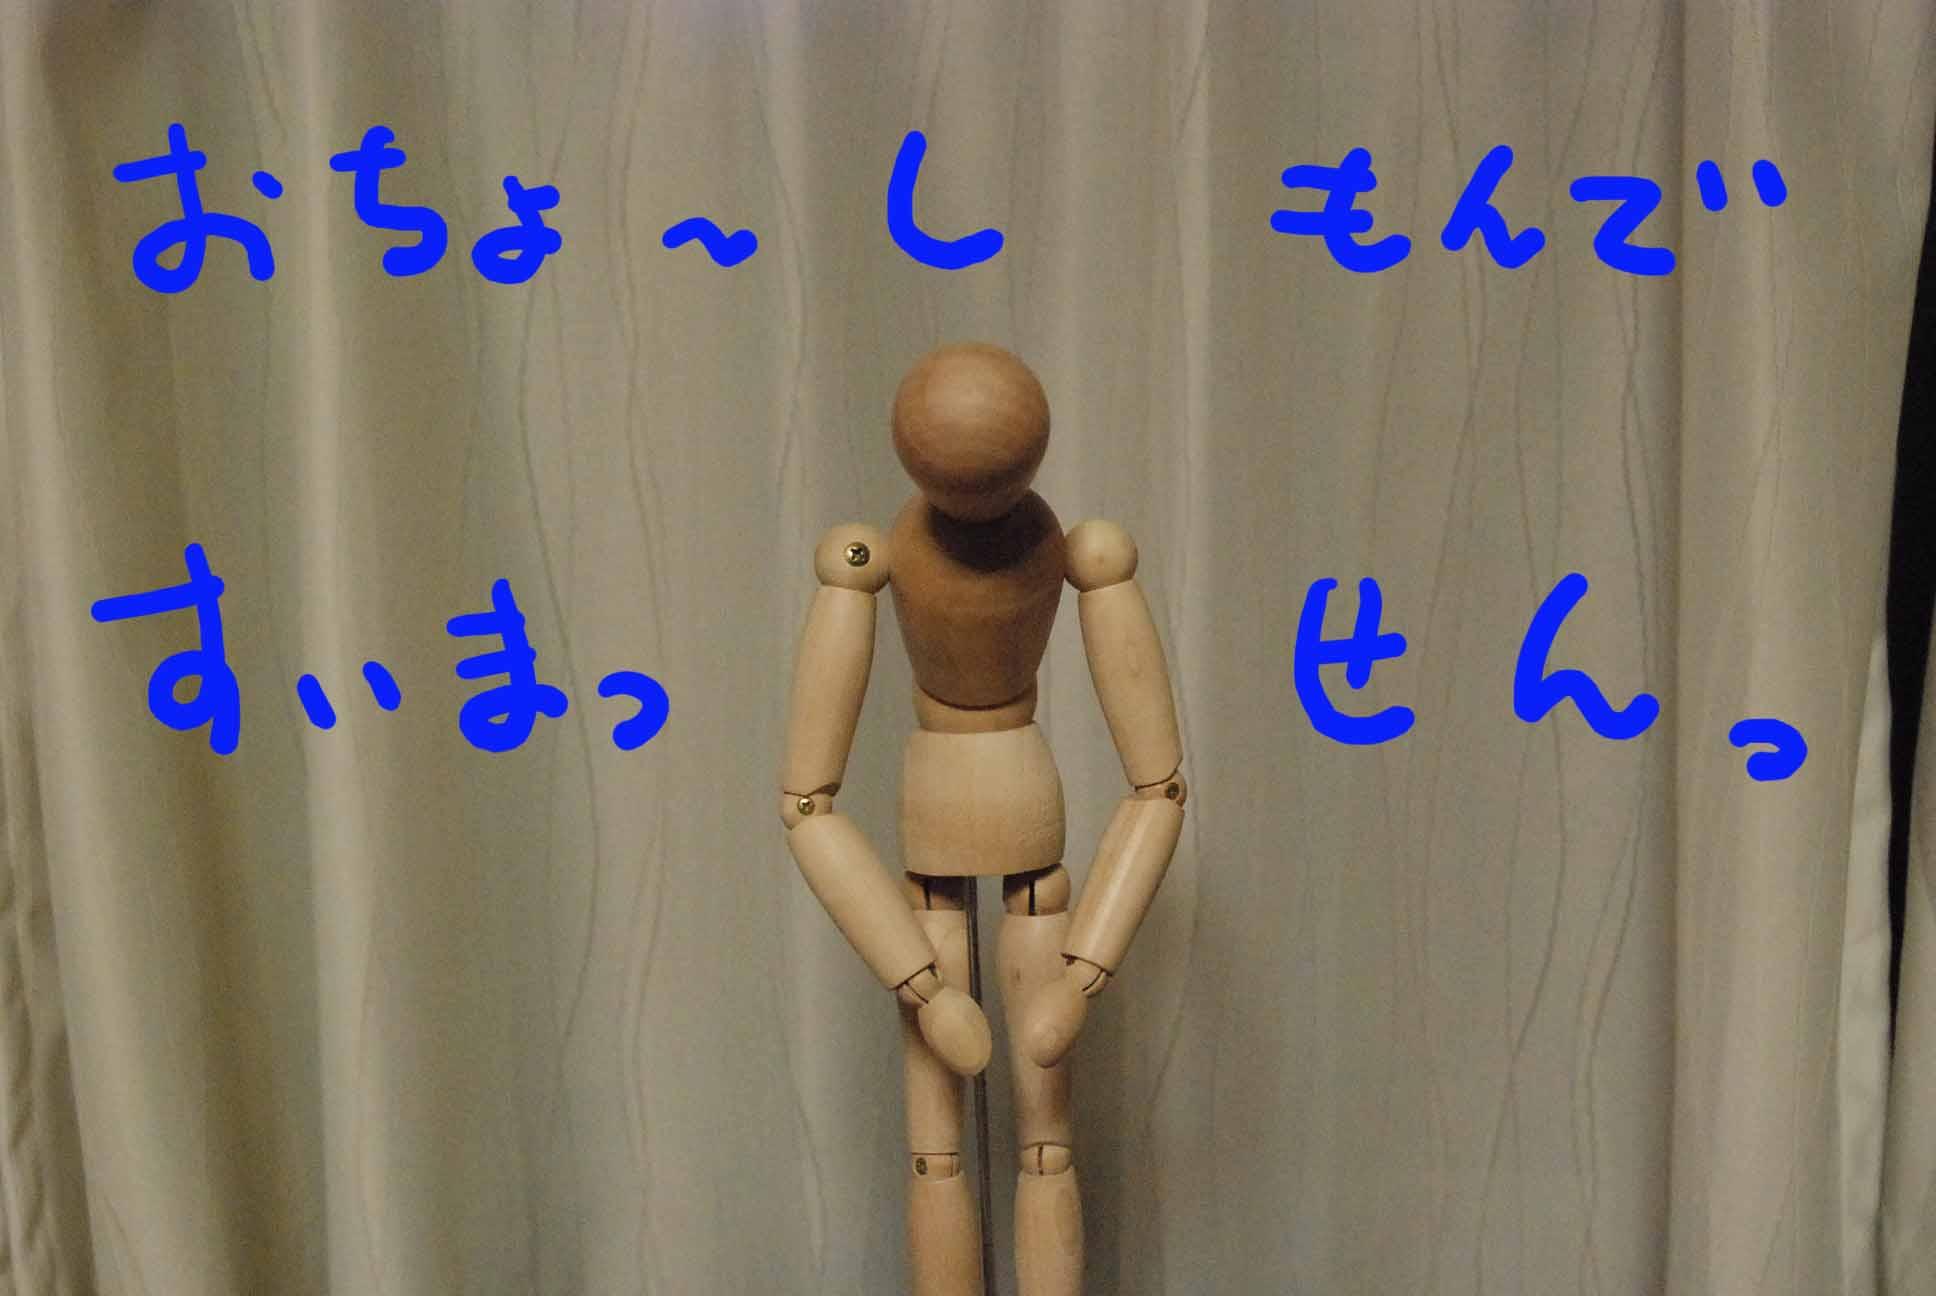 c0109663_232498.jpg